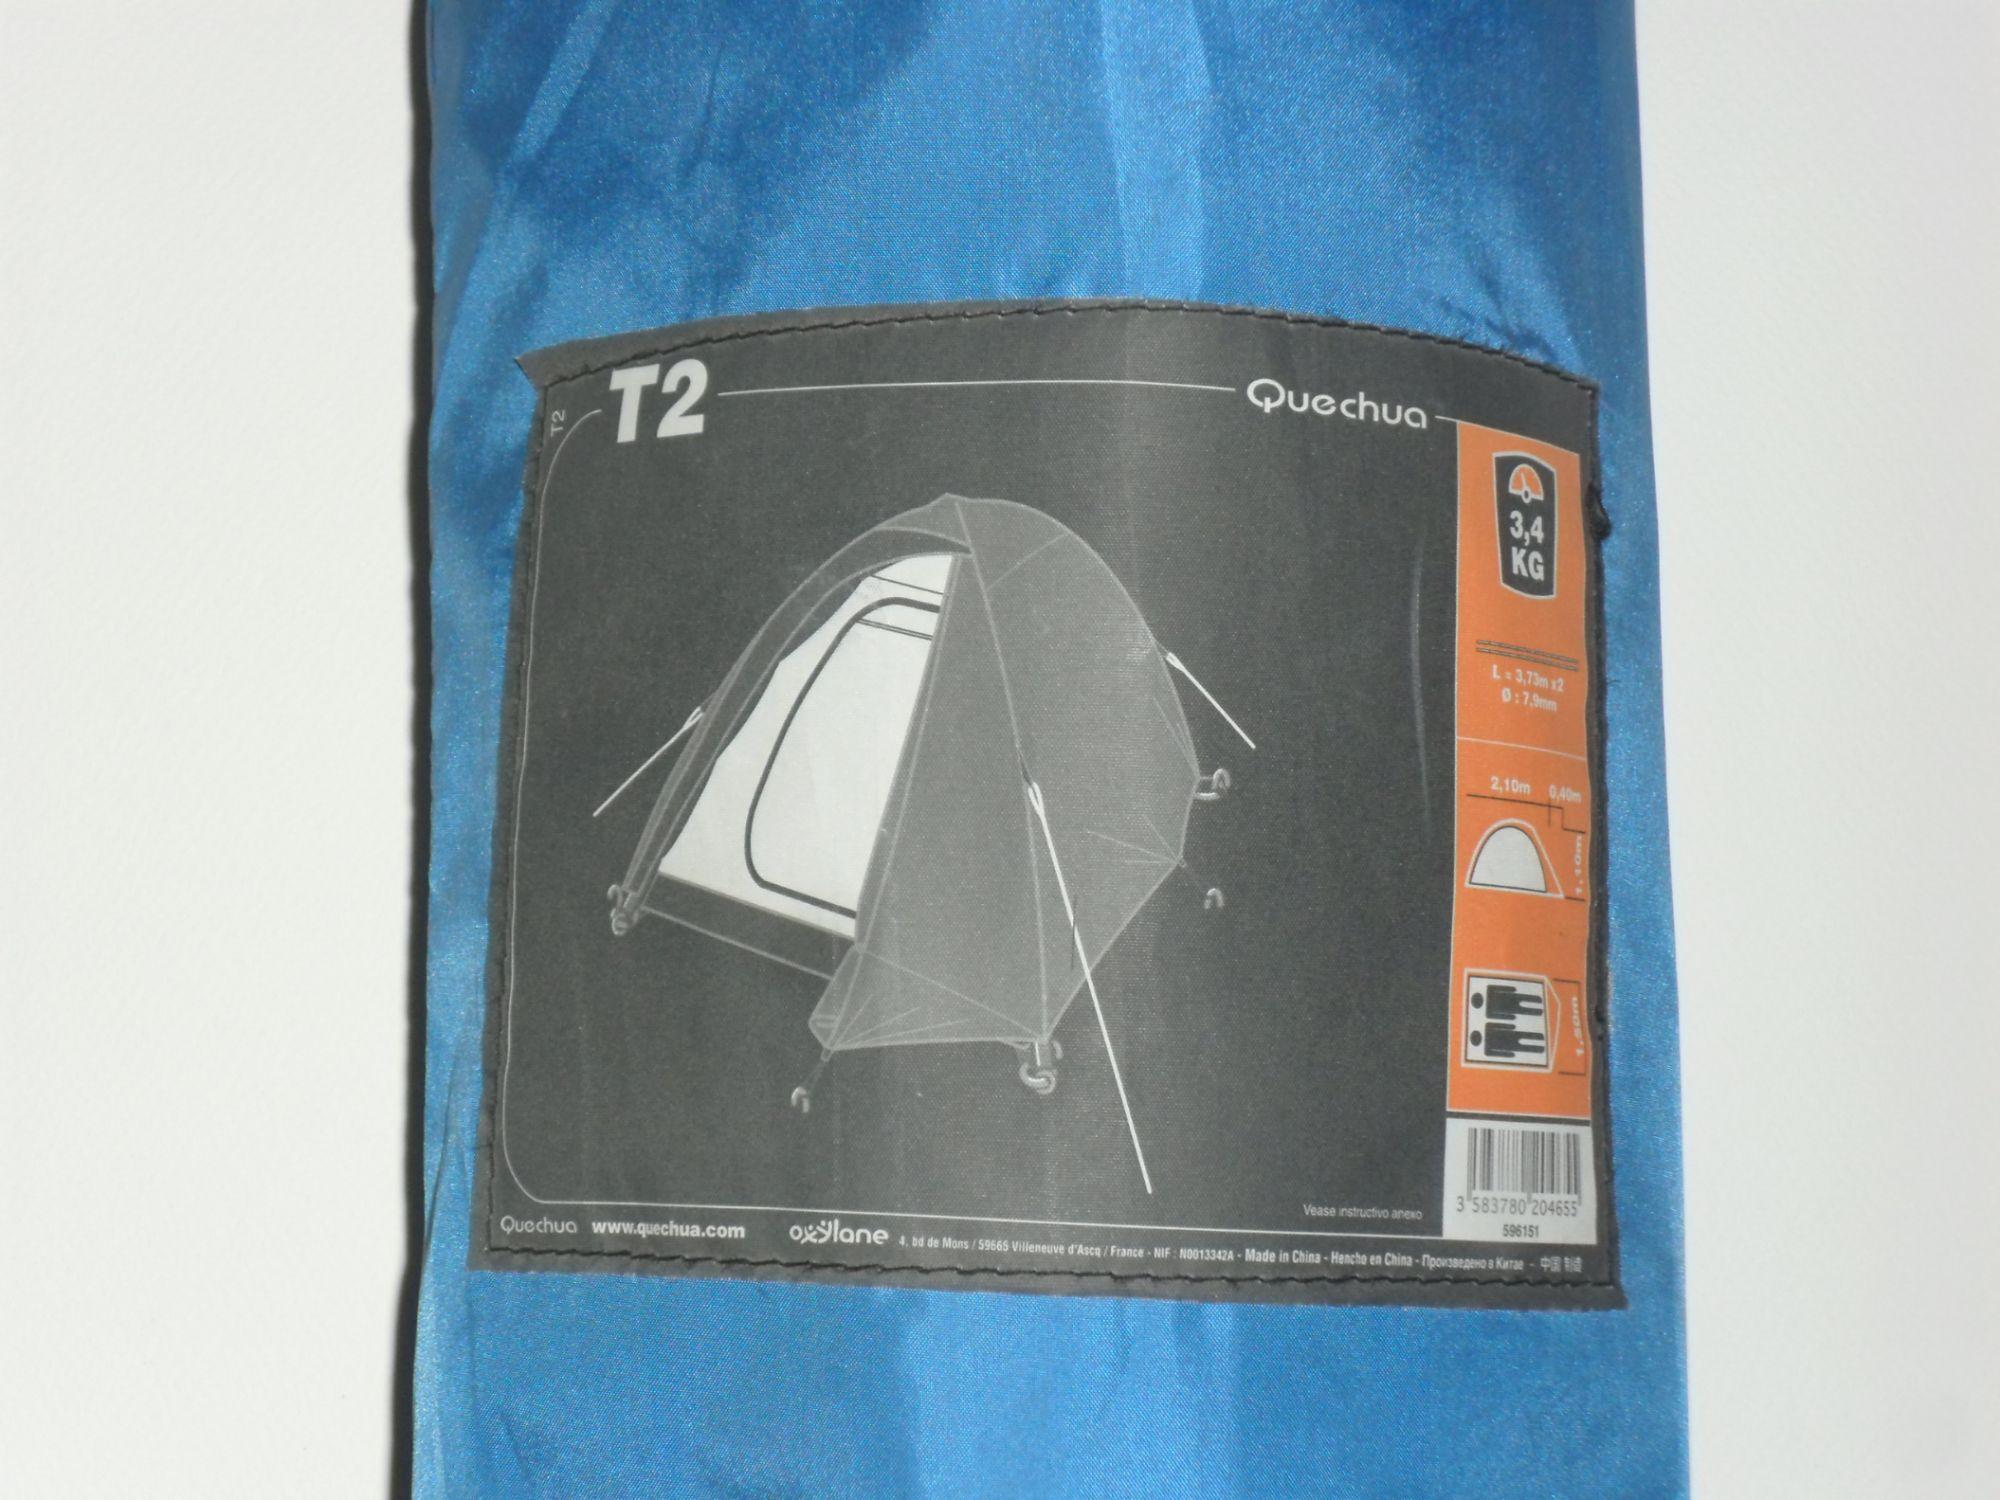 Tente Quechua T2 Randonnee Camping Rakuten